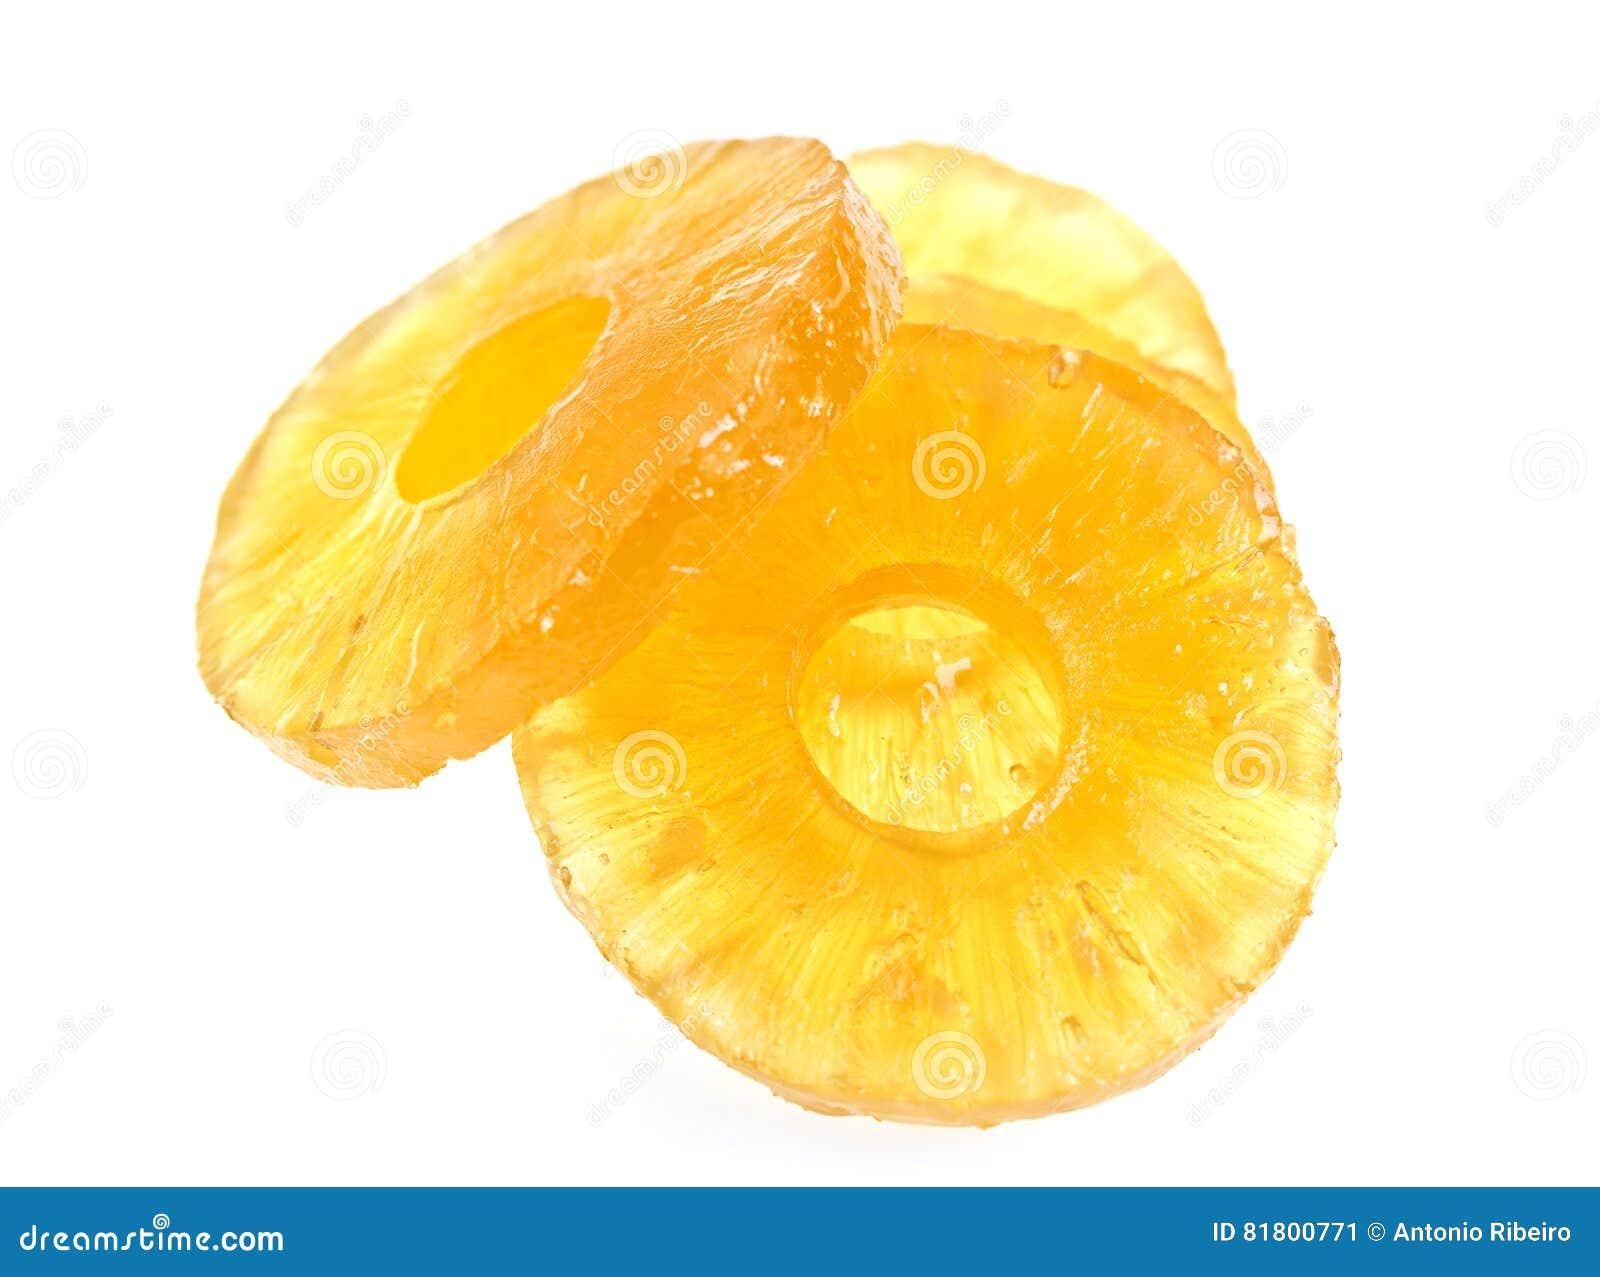 Candied кусок ананаса